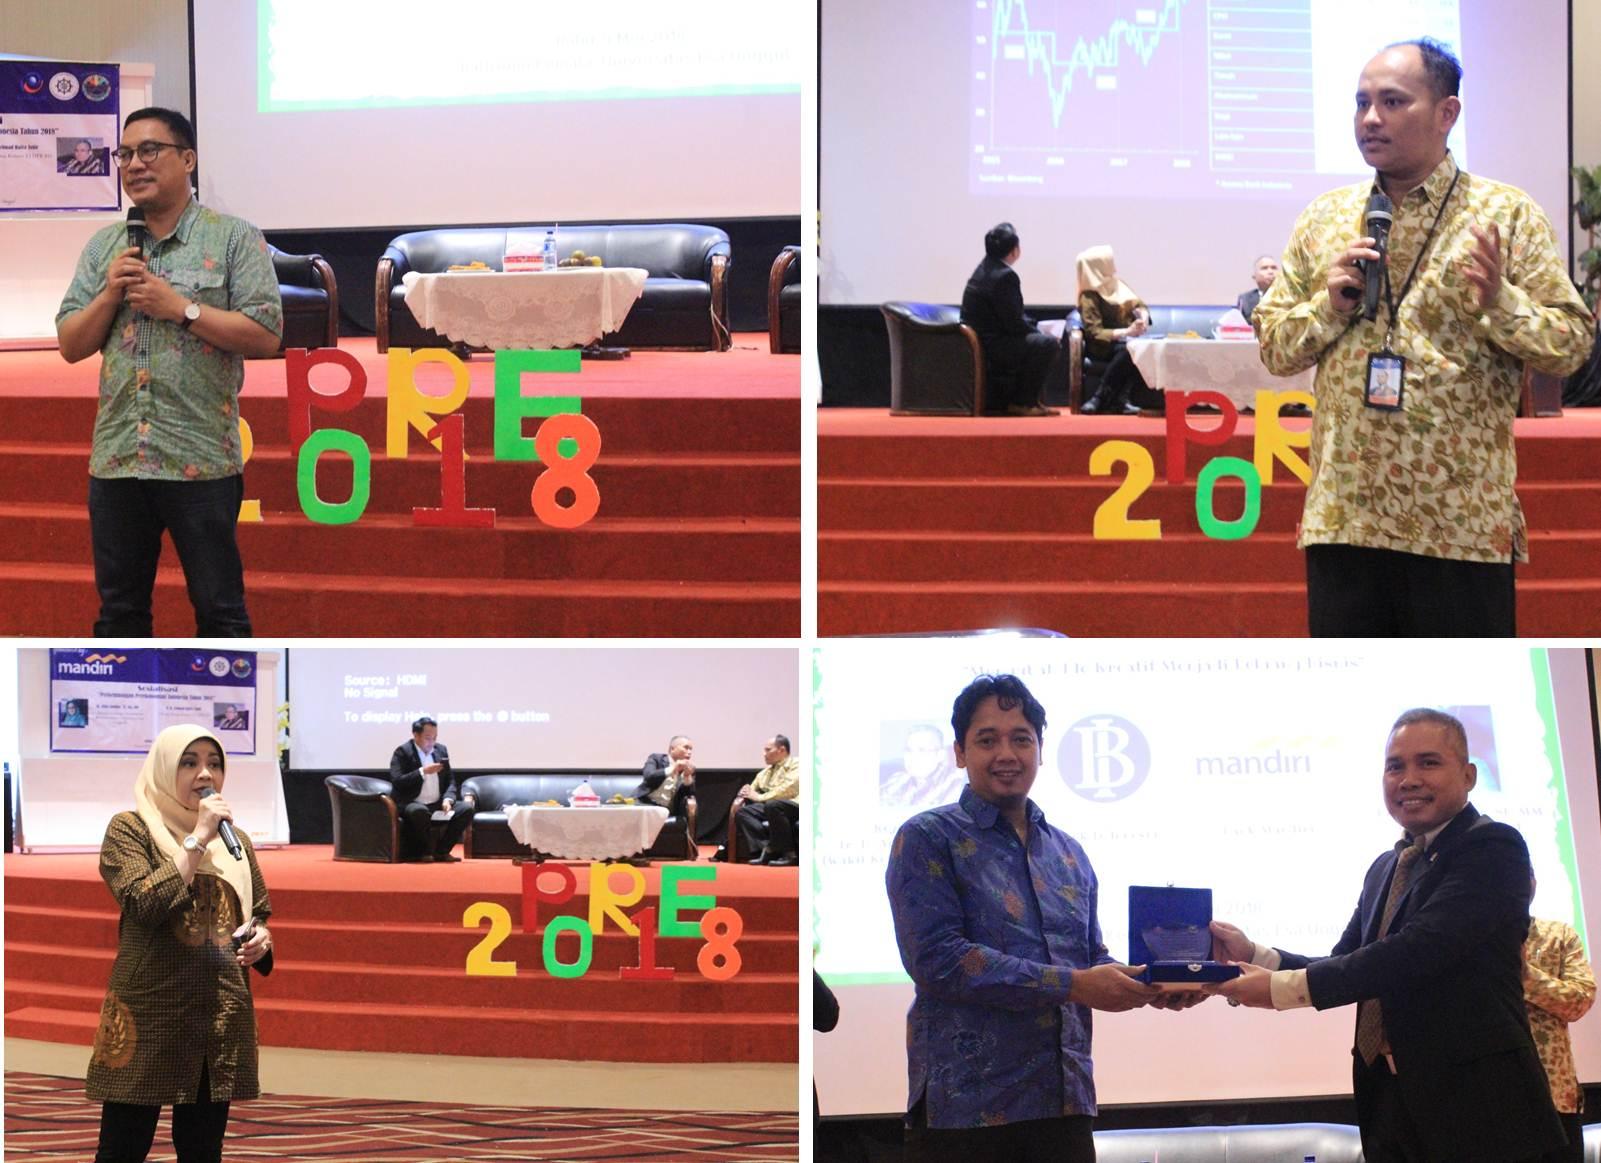 Suasana Saat Pemateri Menyampaikan Materinya dalam seminar Pekan Raya Ekonomi 2018